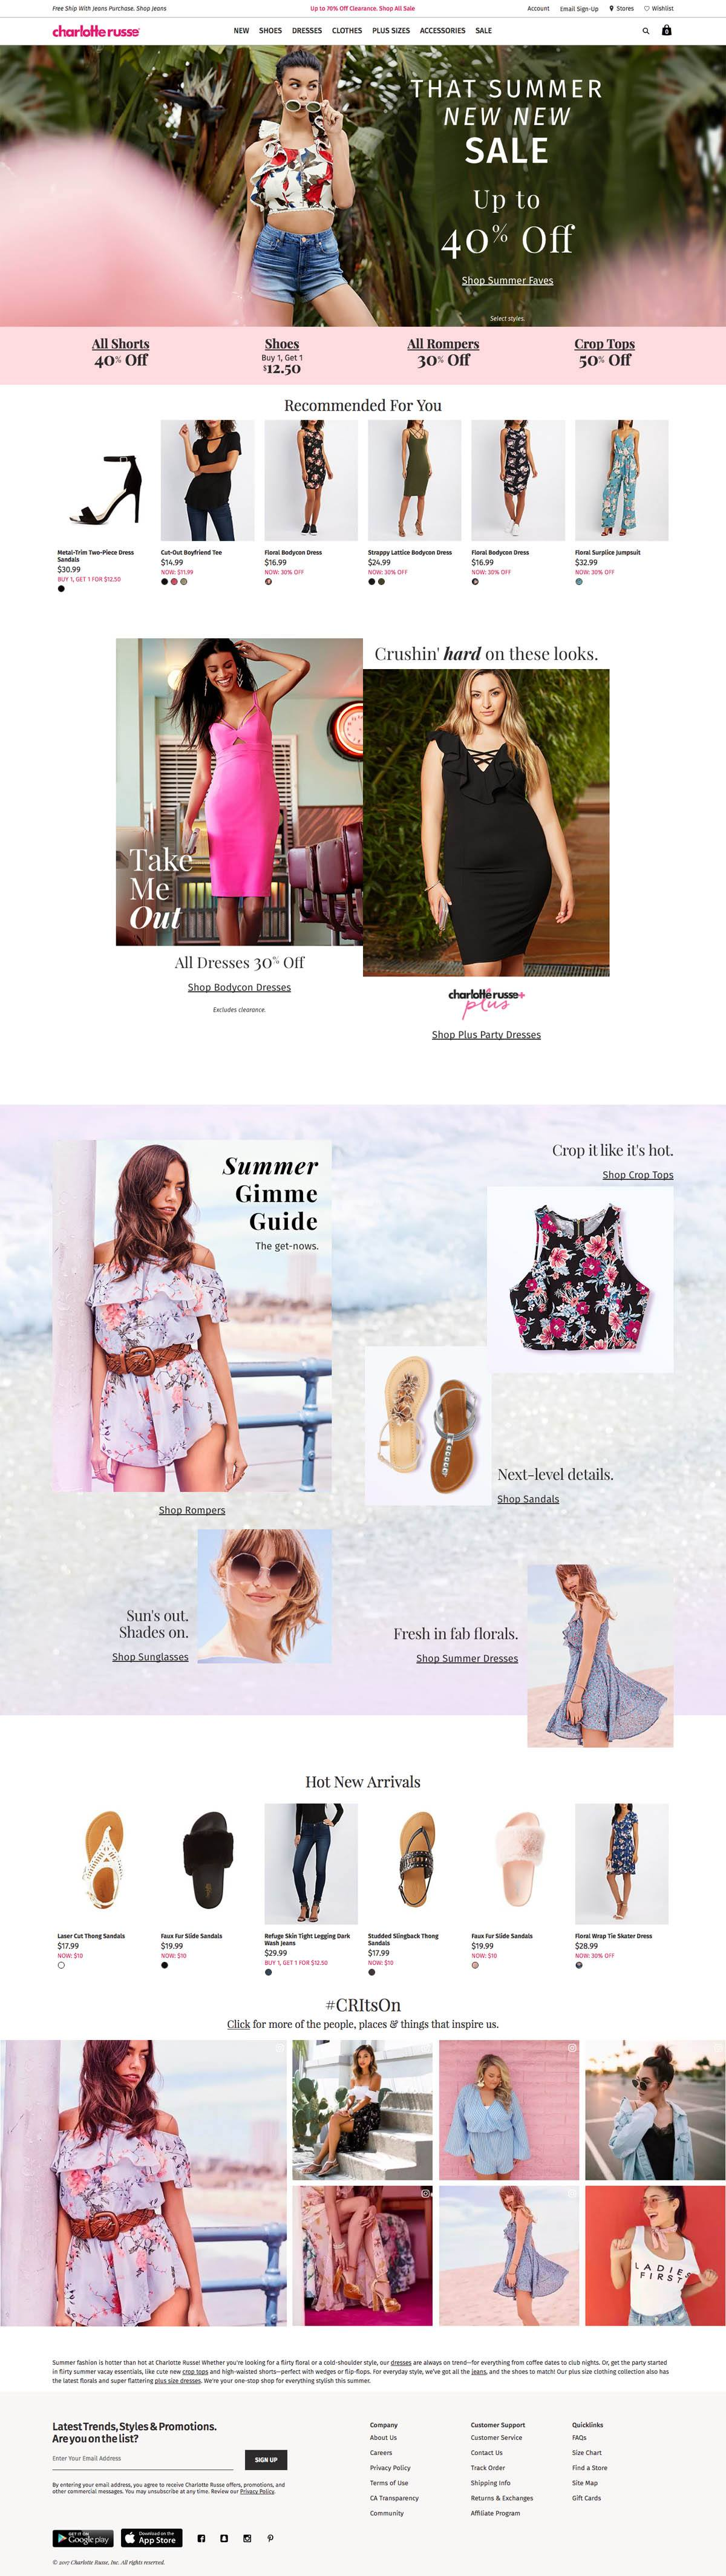 eCommerce website: Charlotte Russe